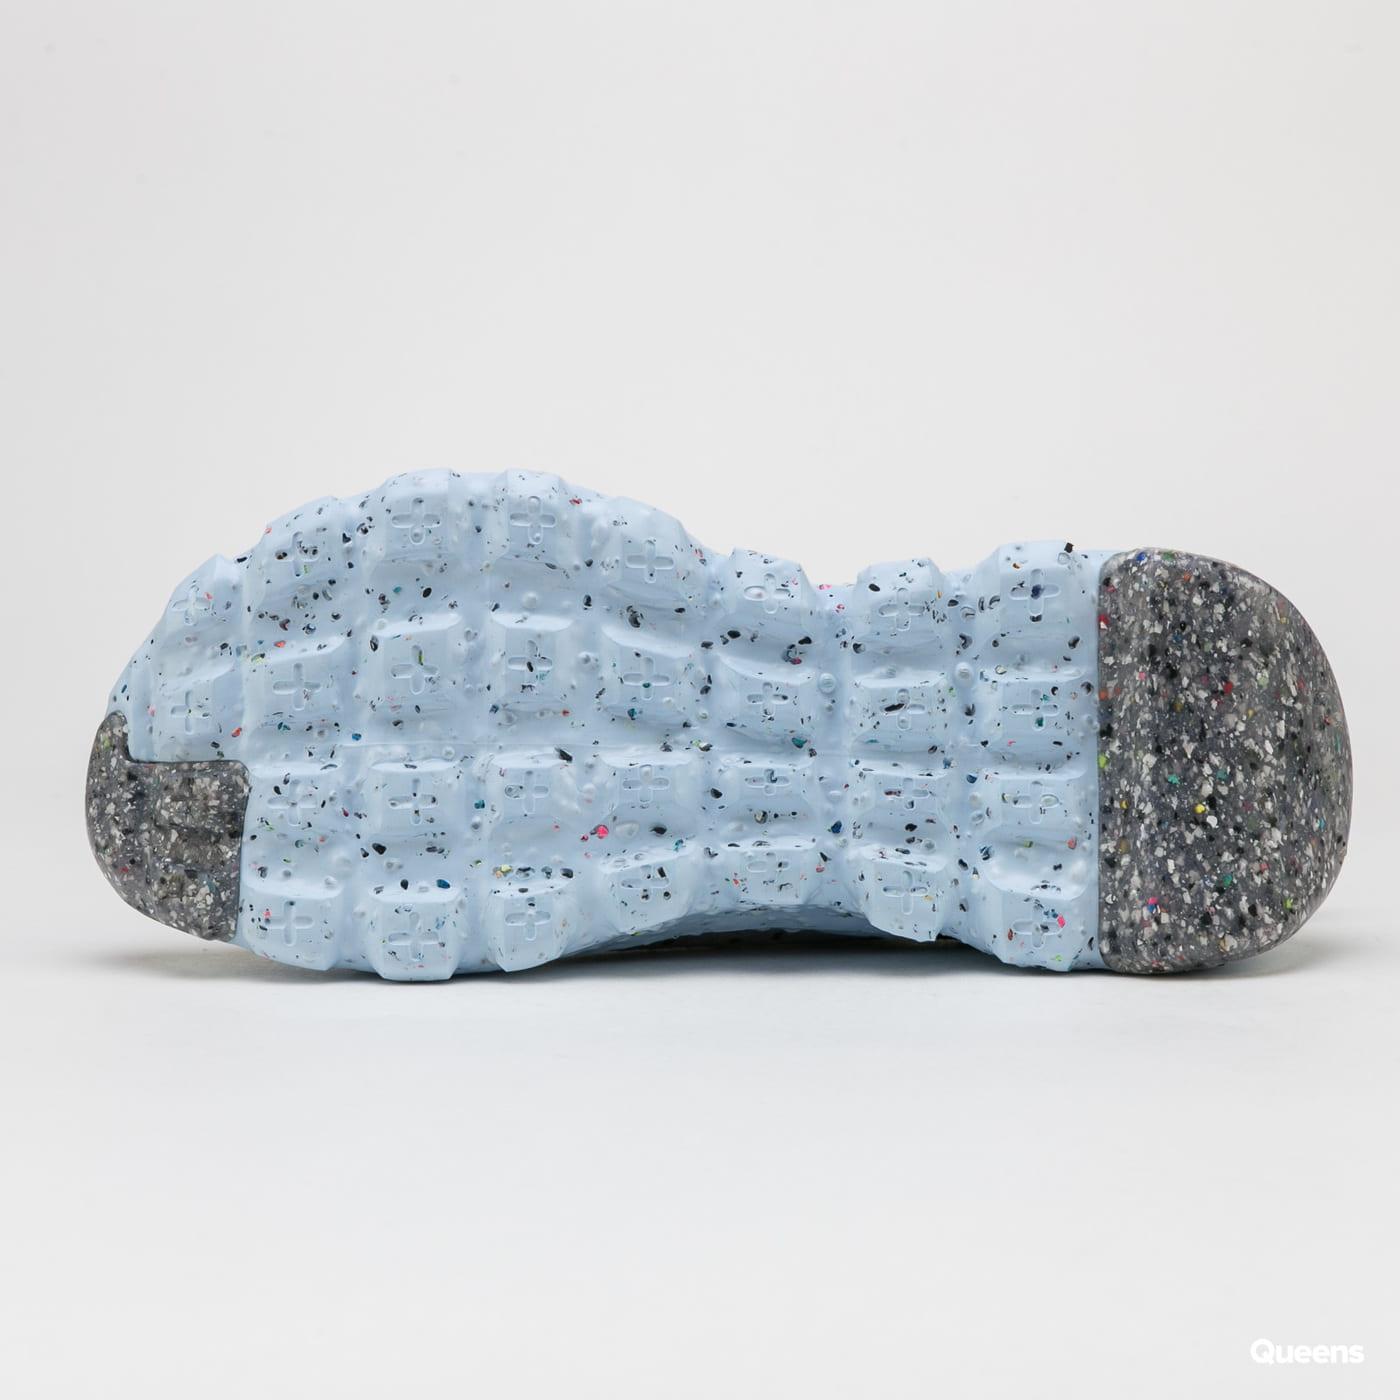 Nike Space Hippie 04 grey / volt - black - dk smoke grey